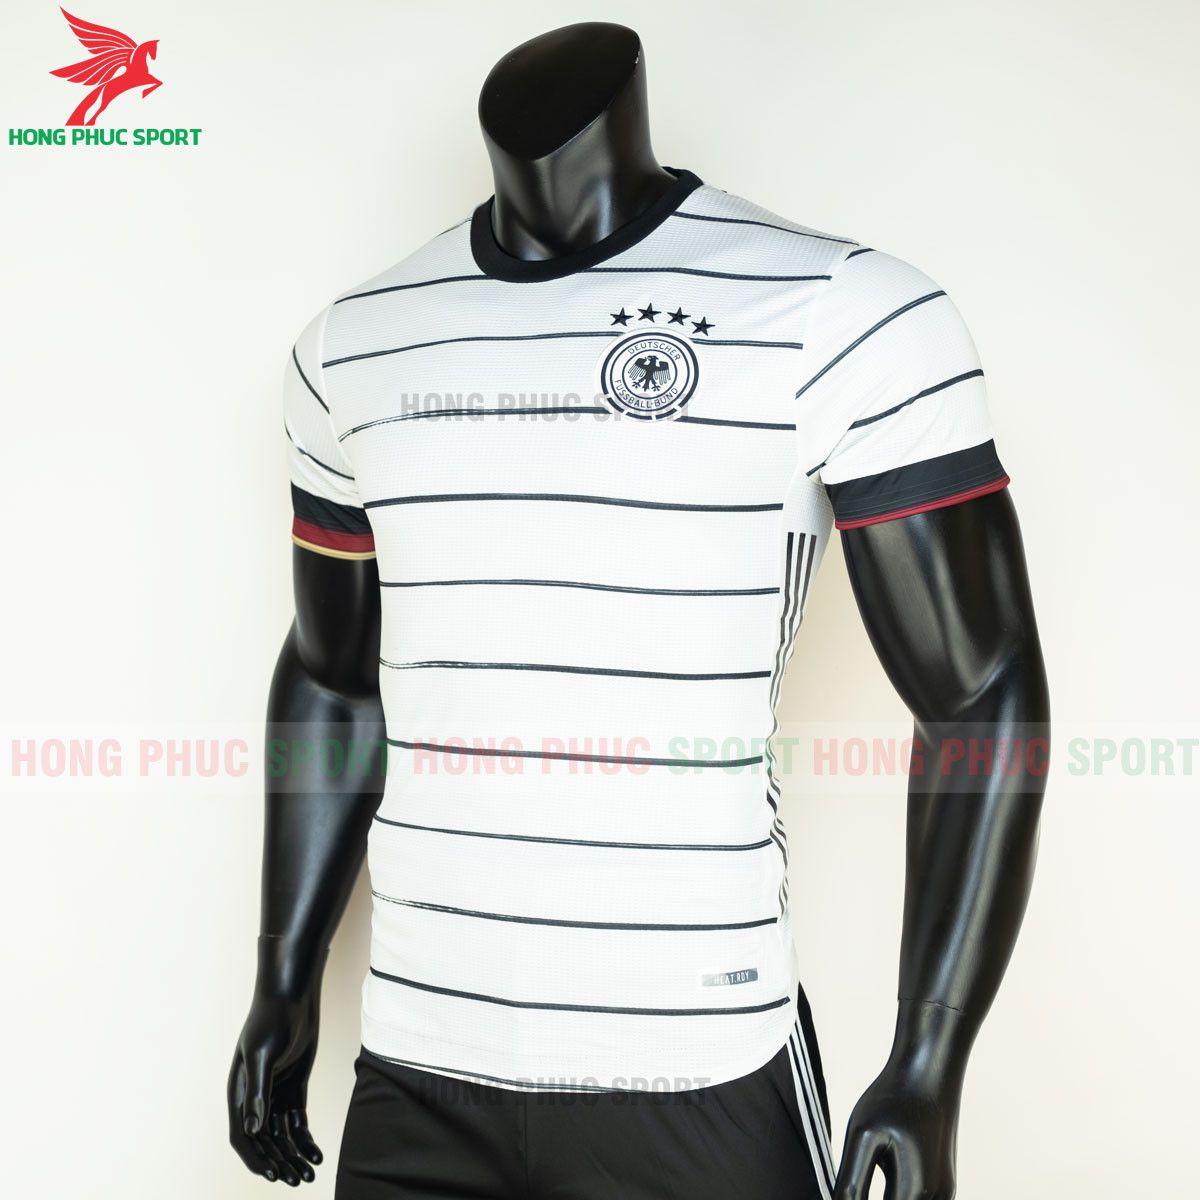 https://cdn.hongphucsport.com/unsafe/s4.shopbay.vn/files/285/ao-bong-da-tuyen-duc-2021-san-nha-hang-thai-4-60d300cda44b1.jpg